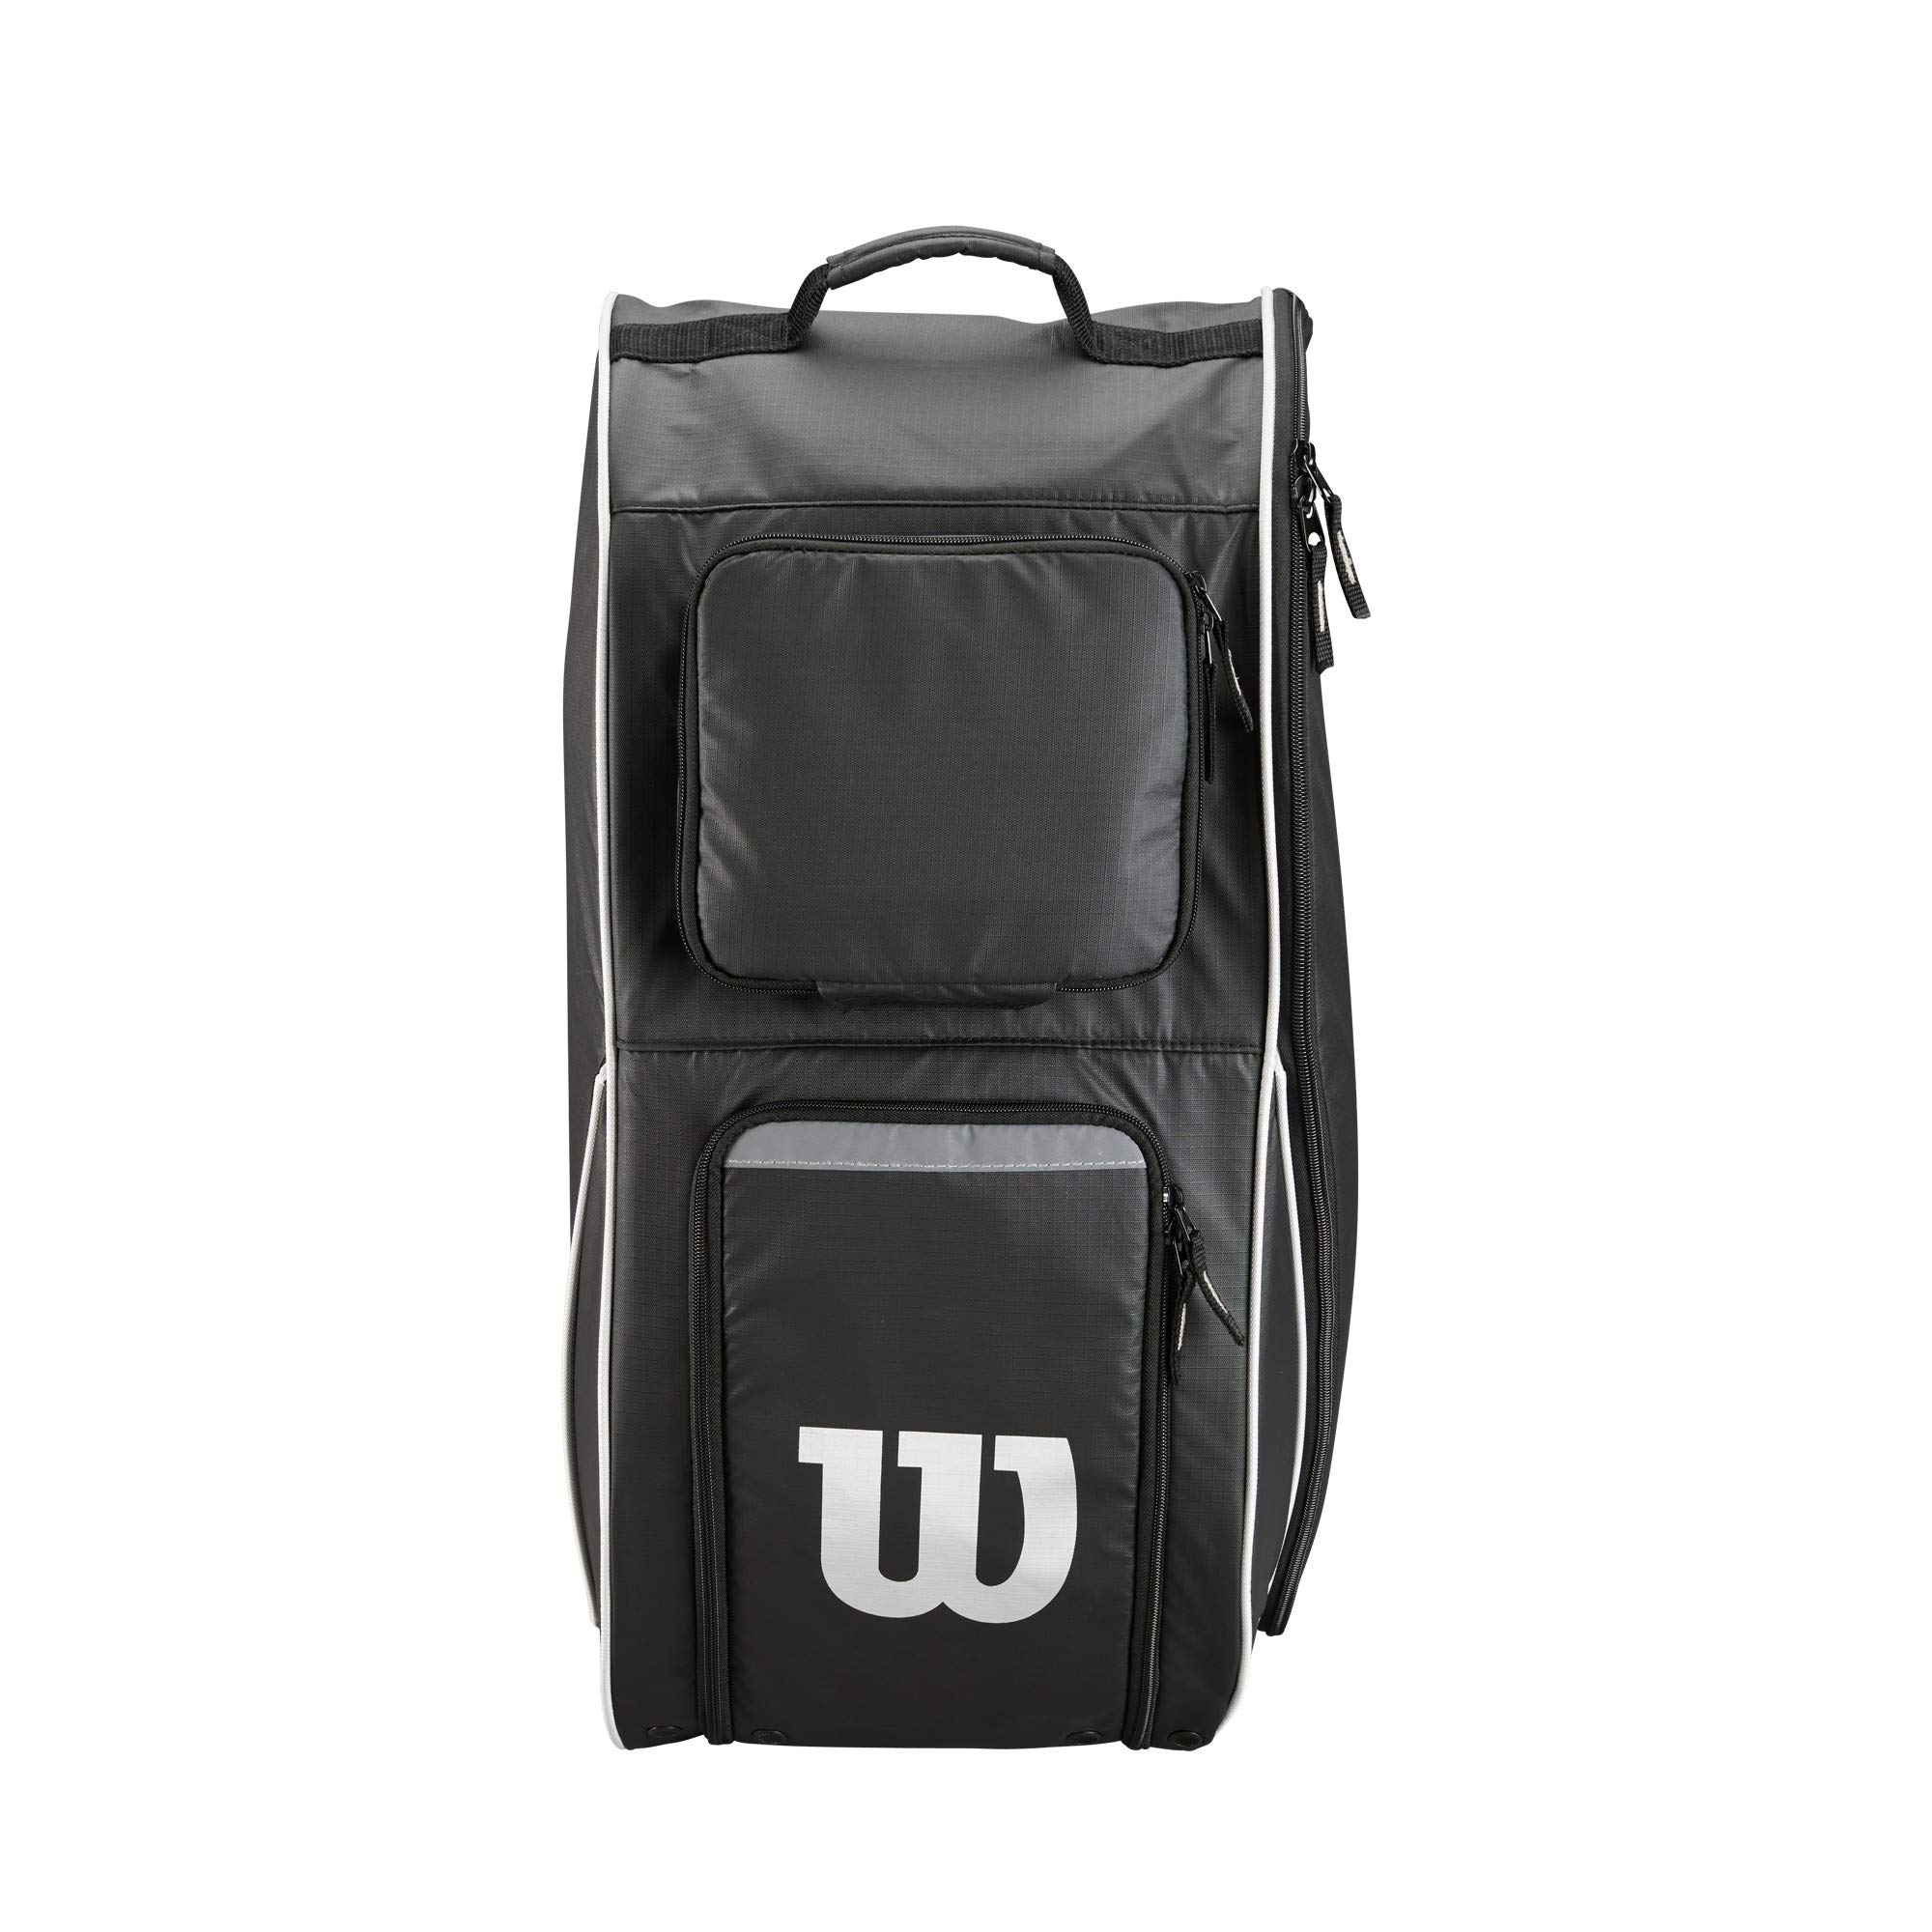 Wilson Tackle Football Player Equipment Bag